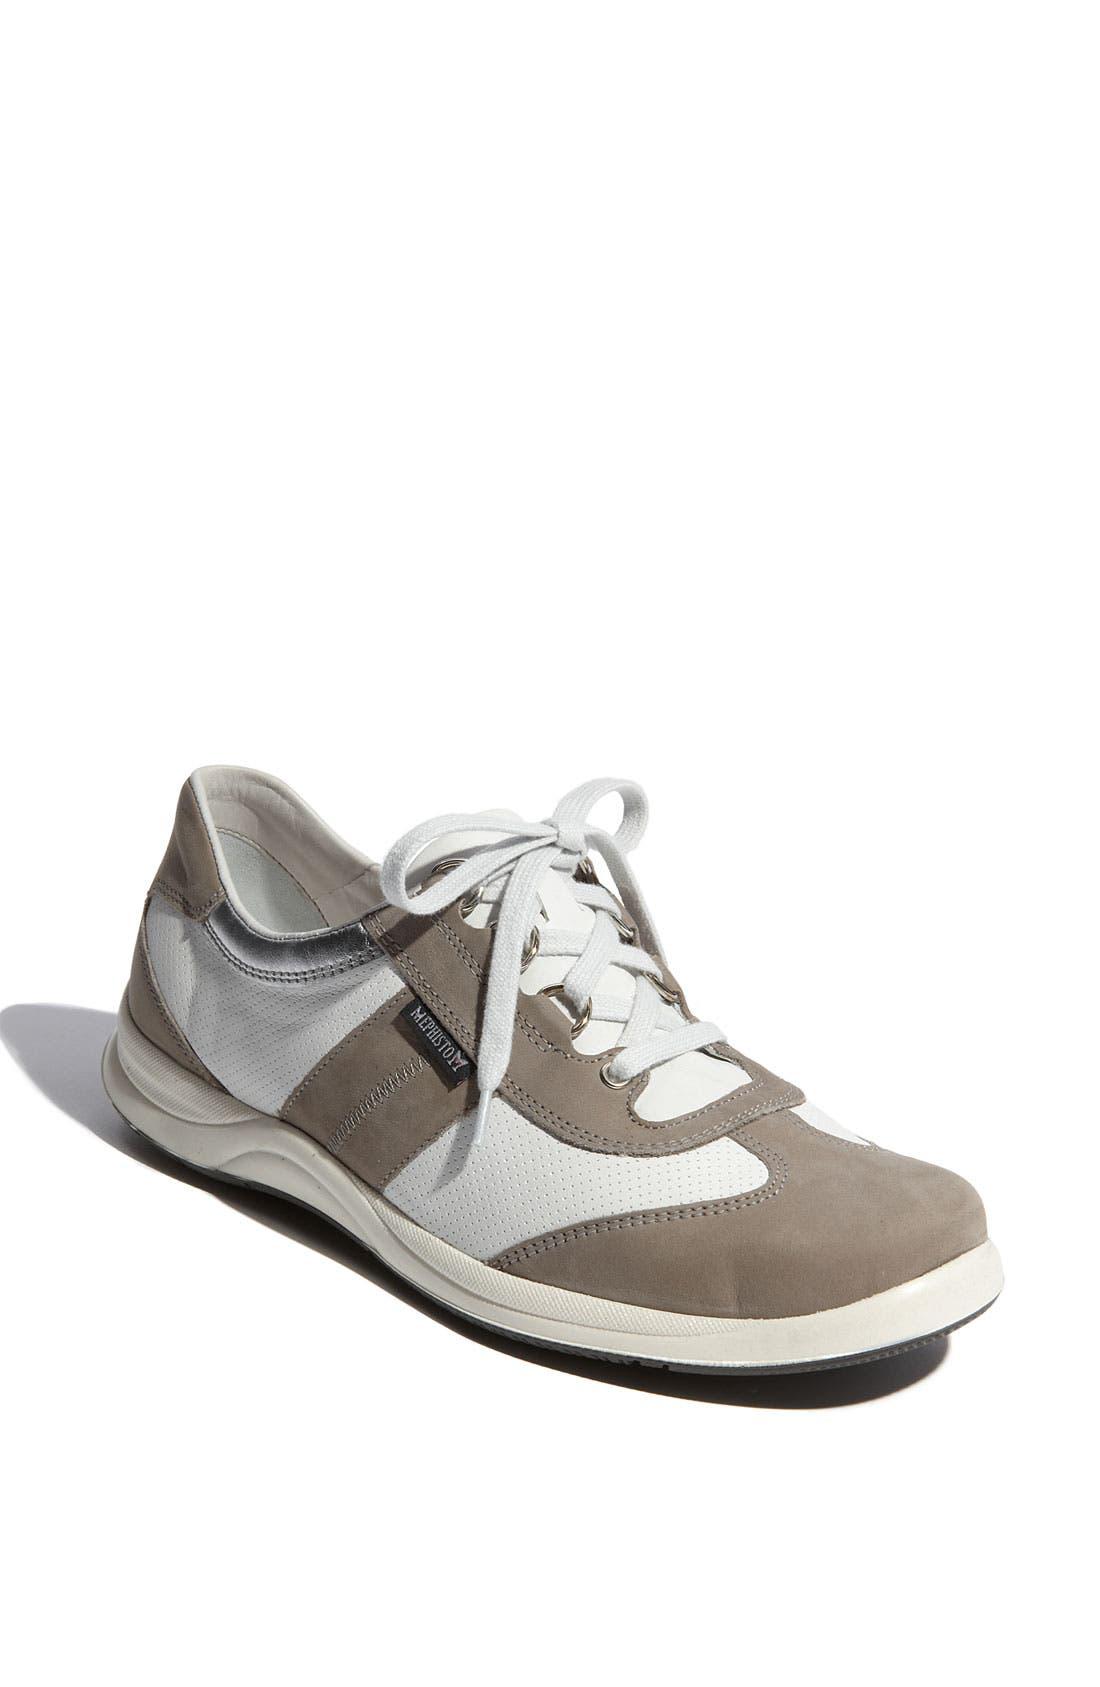 Laser Perforated Walking Shoe,                             Main thumbnail 6, color,